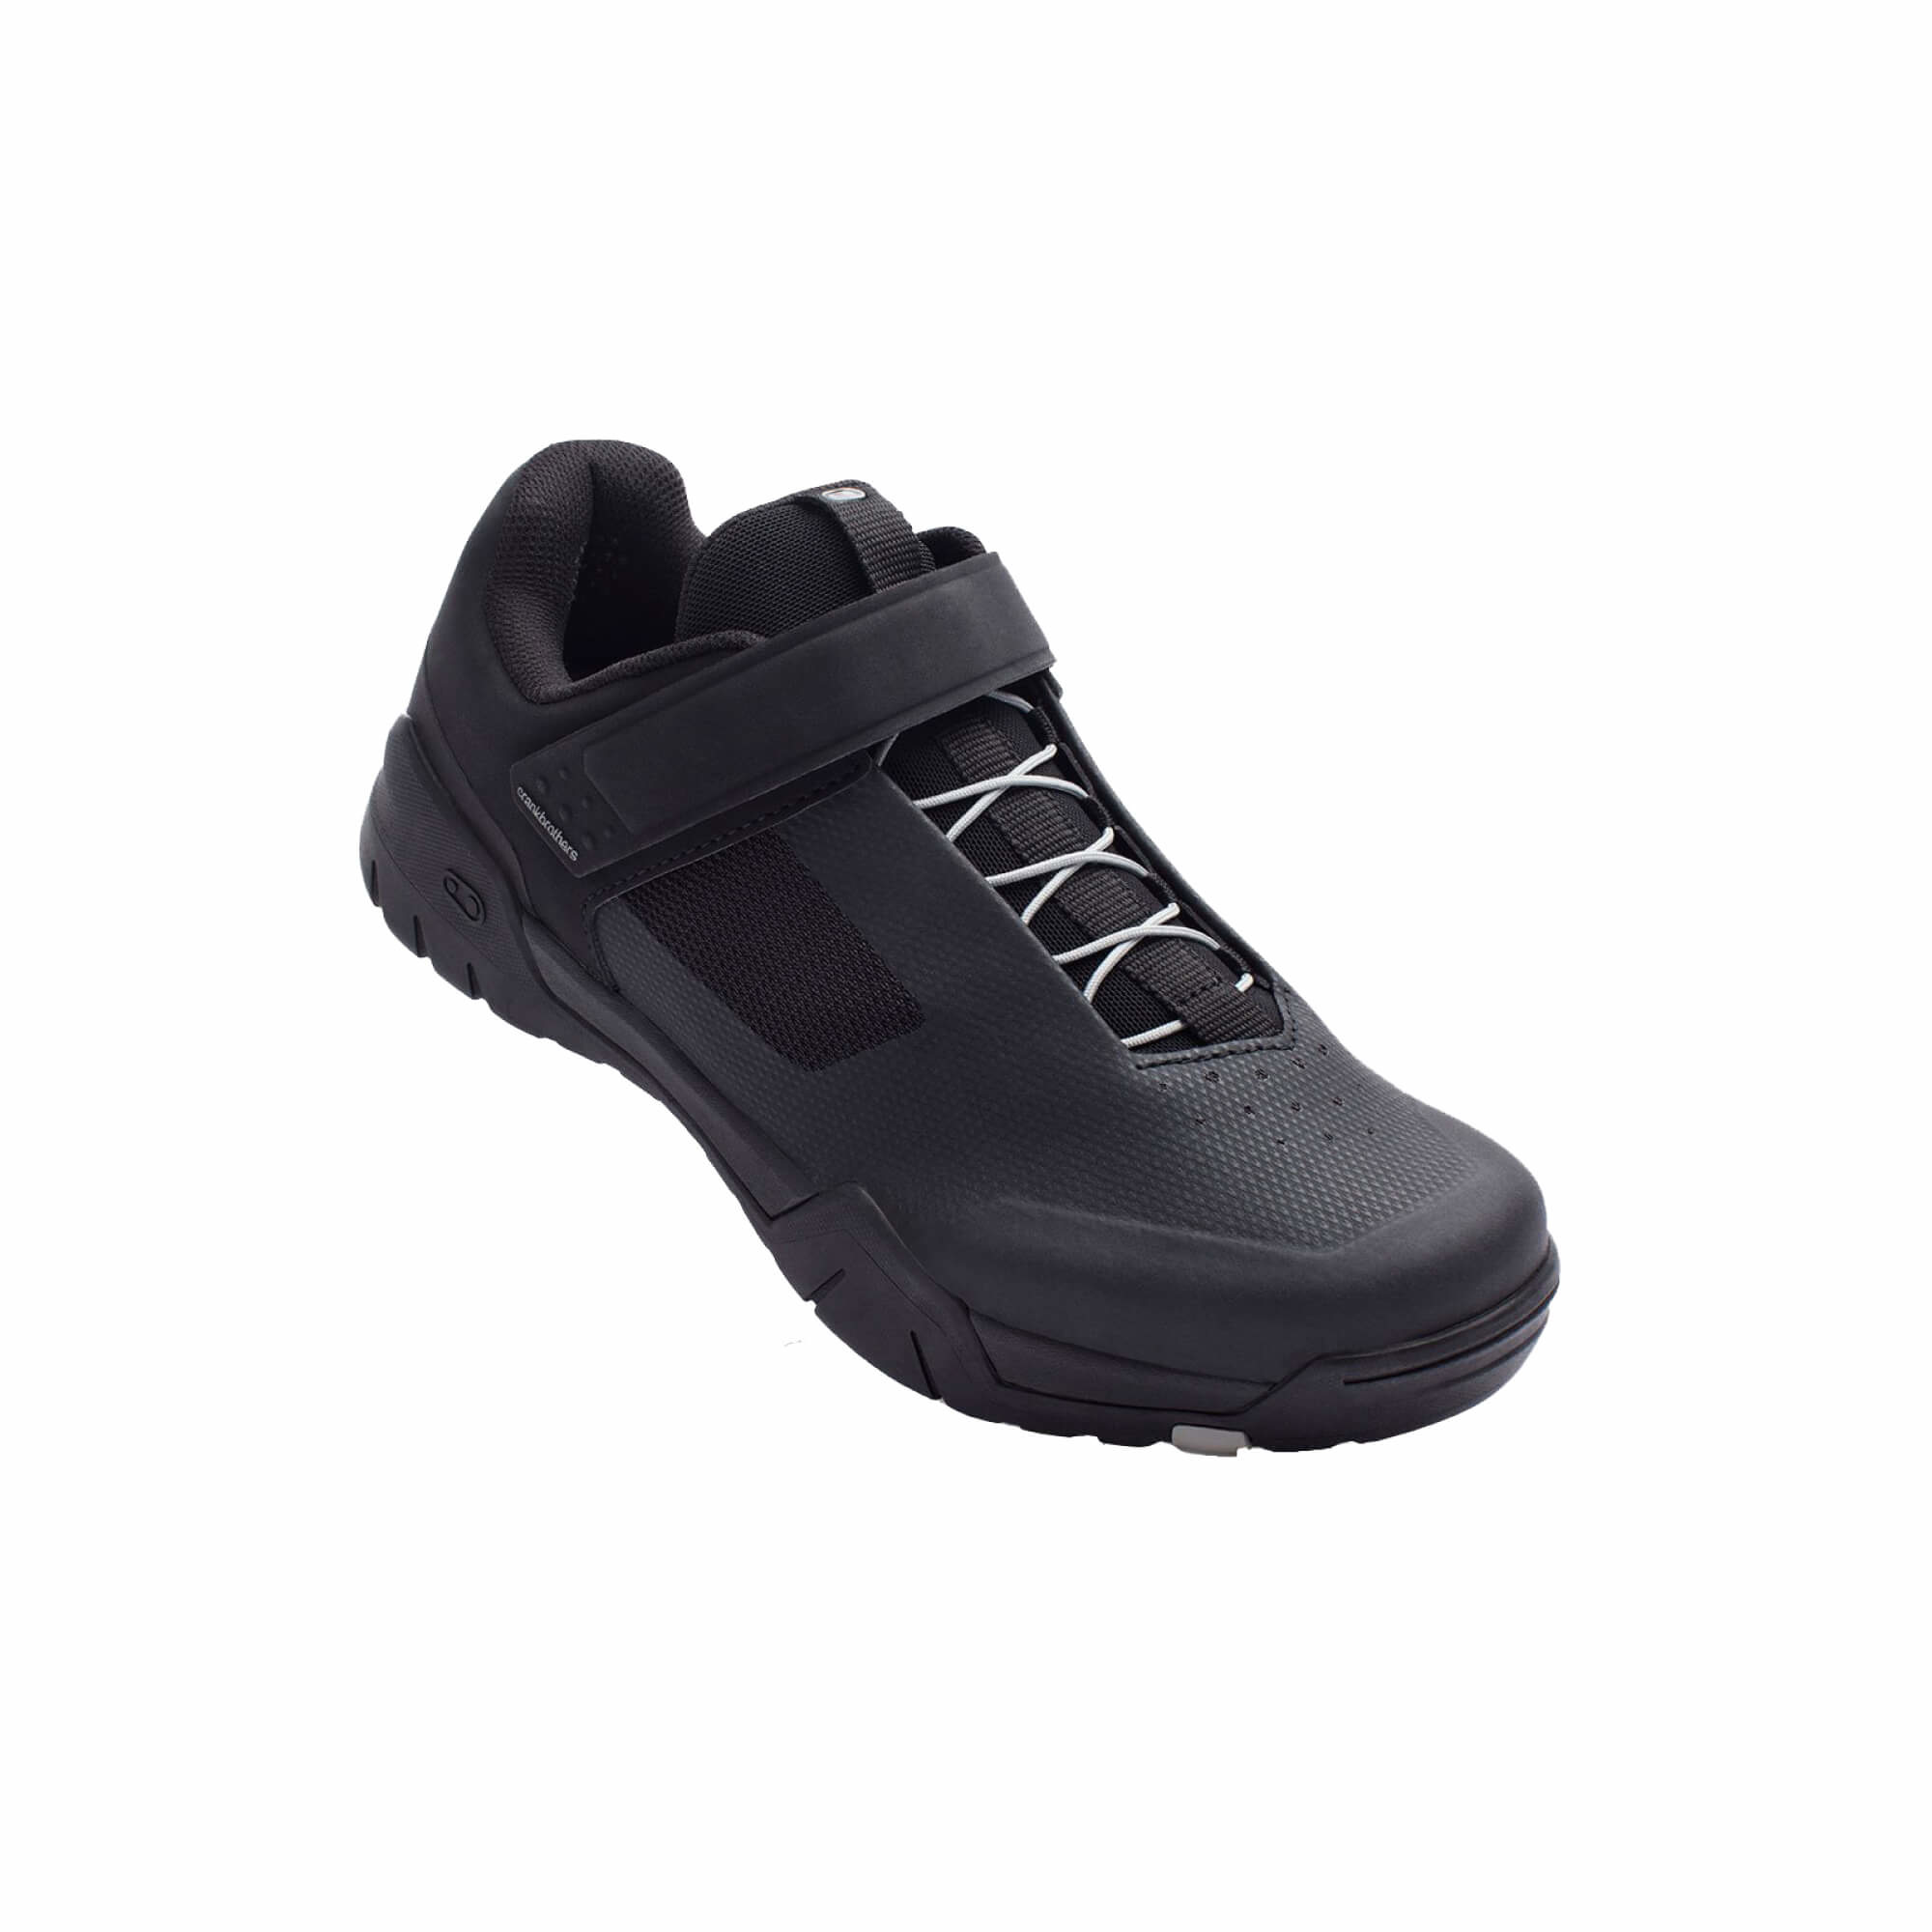 Shoes Mallet Speedlace Clipless Spd-3